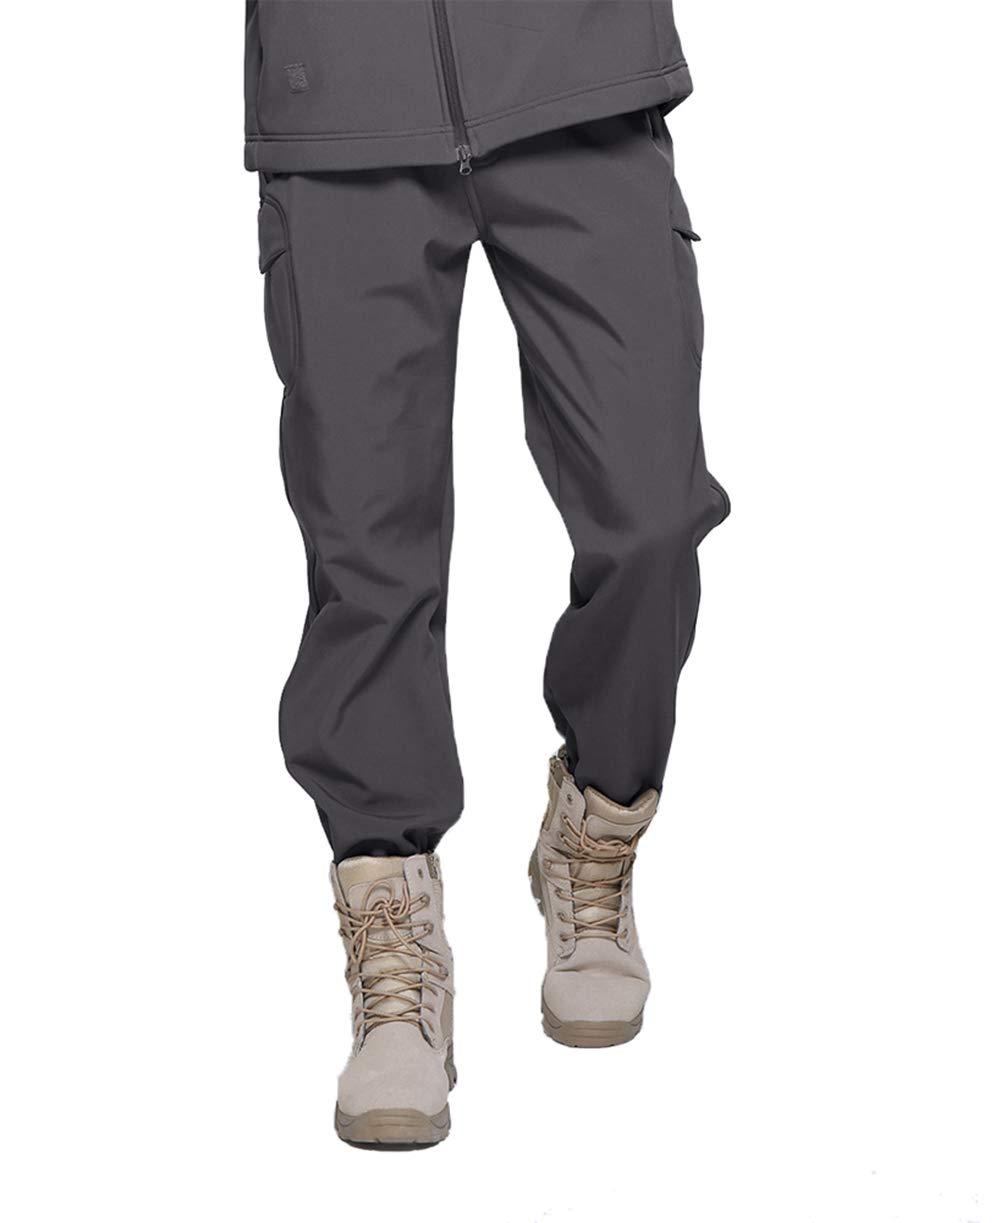 TACVASEN Mens Tactical Military Pants Fleece Lining Softshell Pants Trousers XLTP-40